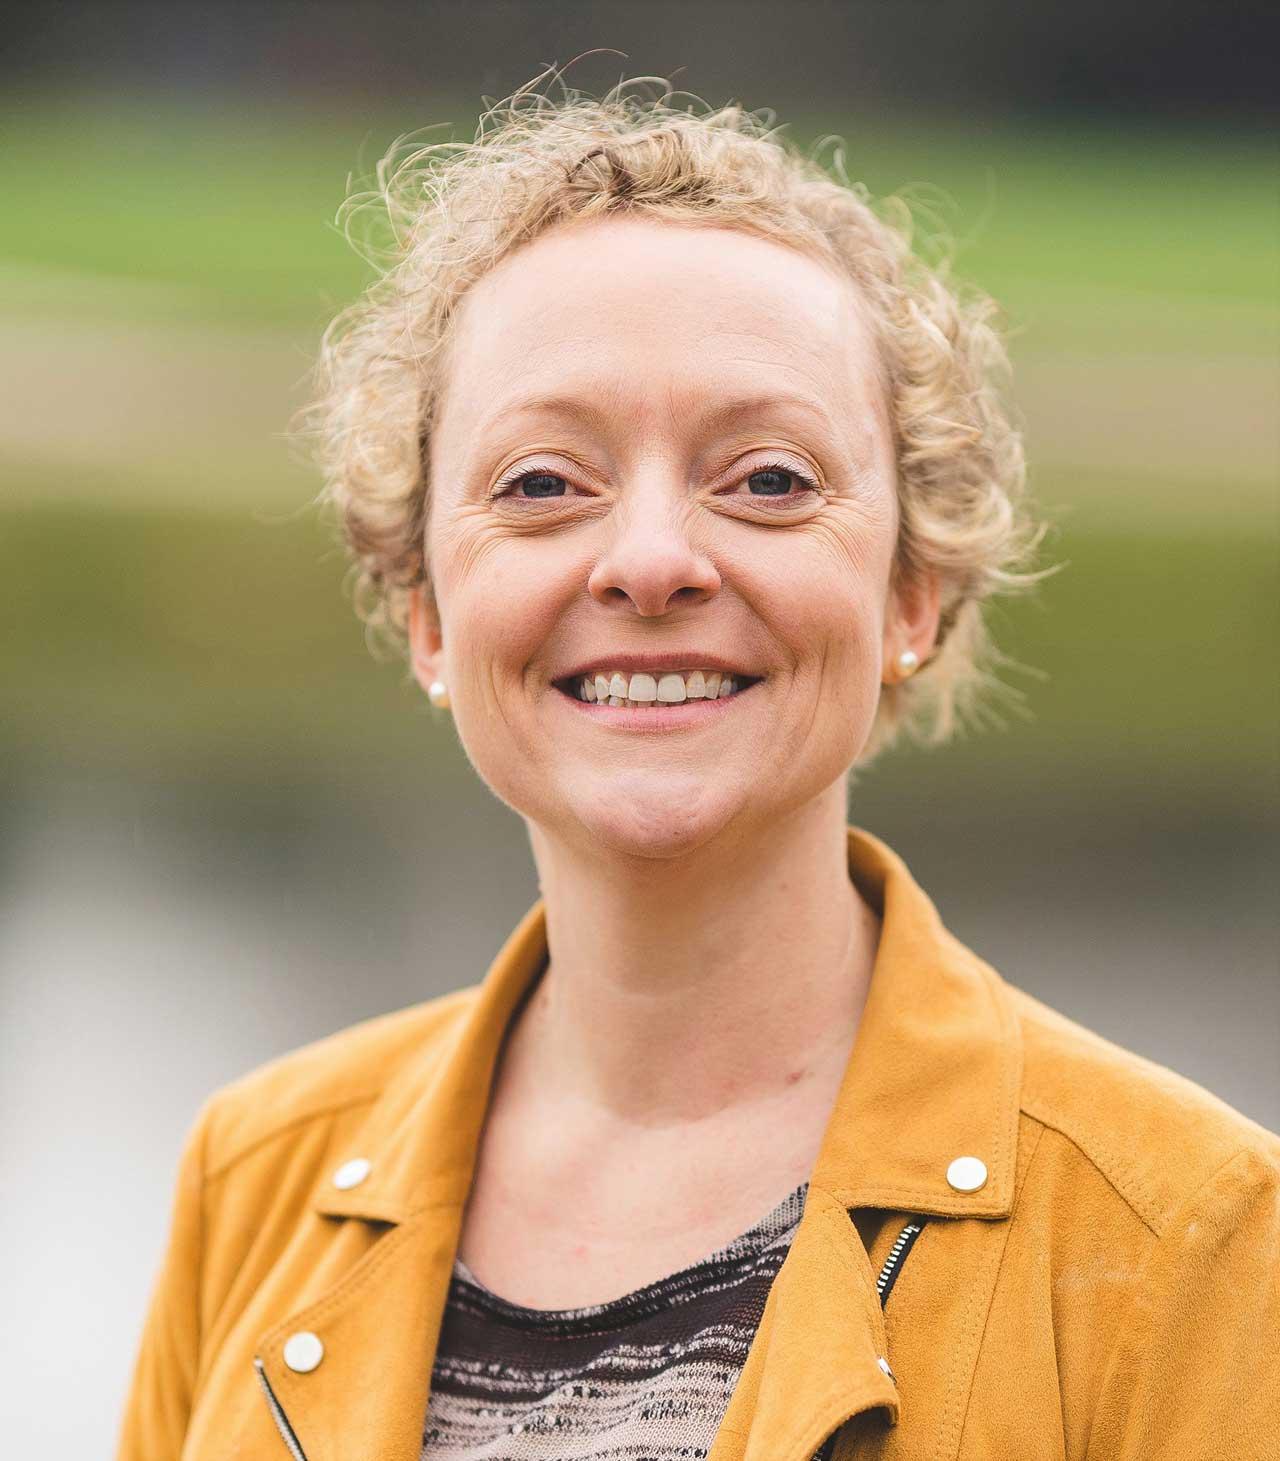 Nadine-Heselhaus-SPD-Bundestagswahl-2021